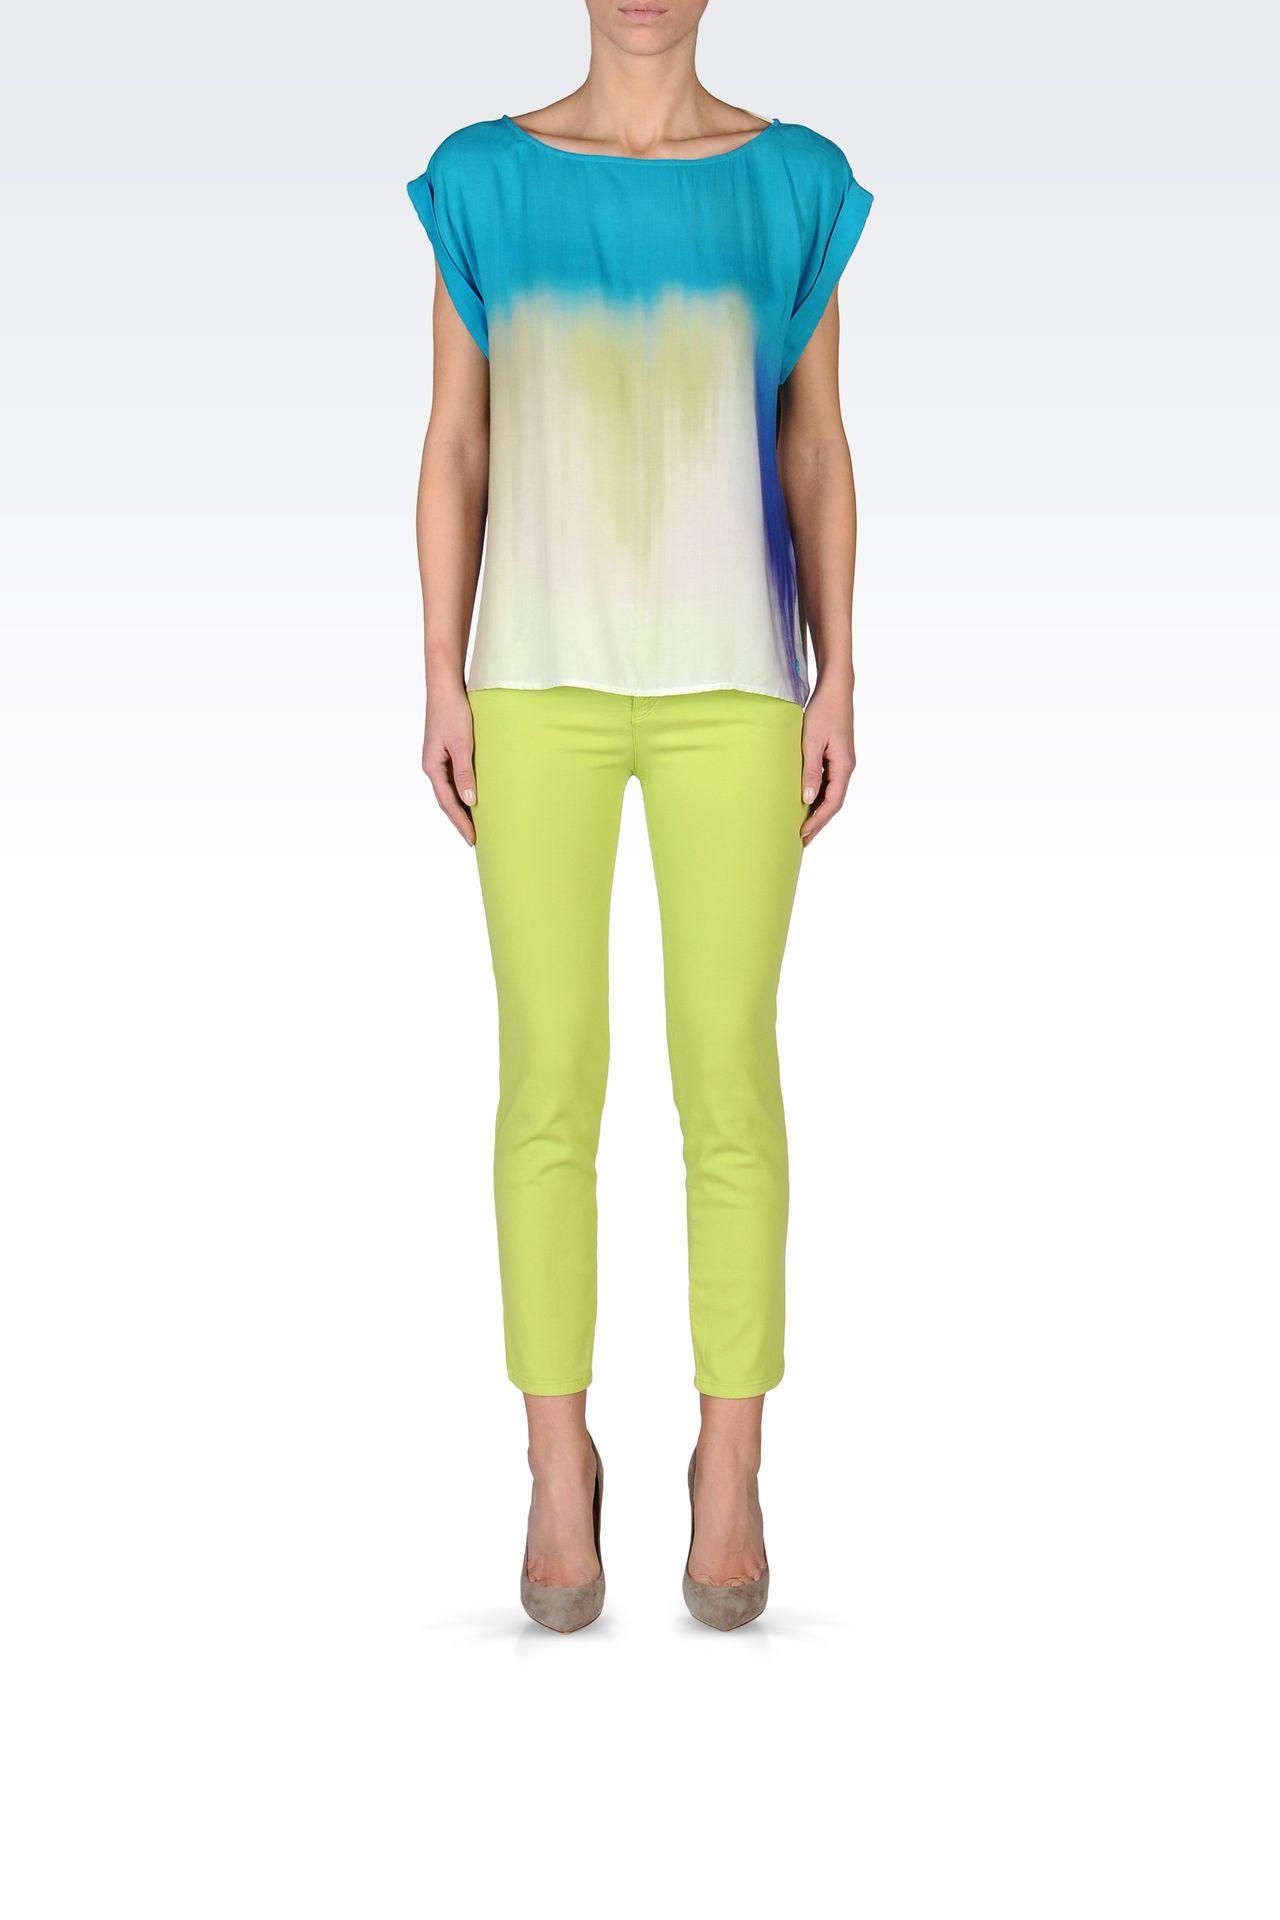 VISCOSE TIE DYE EFFECT BLOUSE: Short-sleeved tops Women by Armani - 0